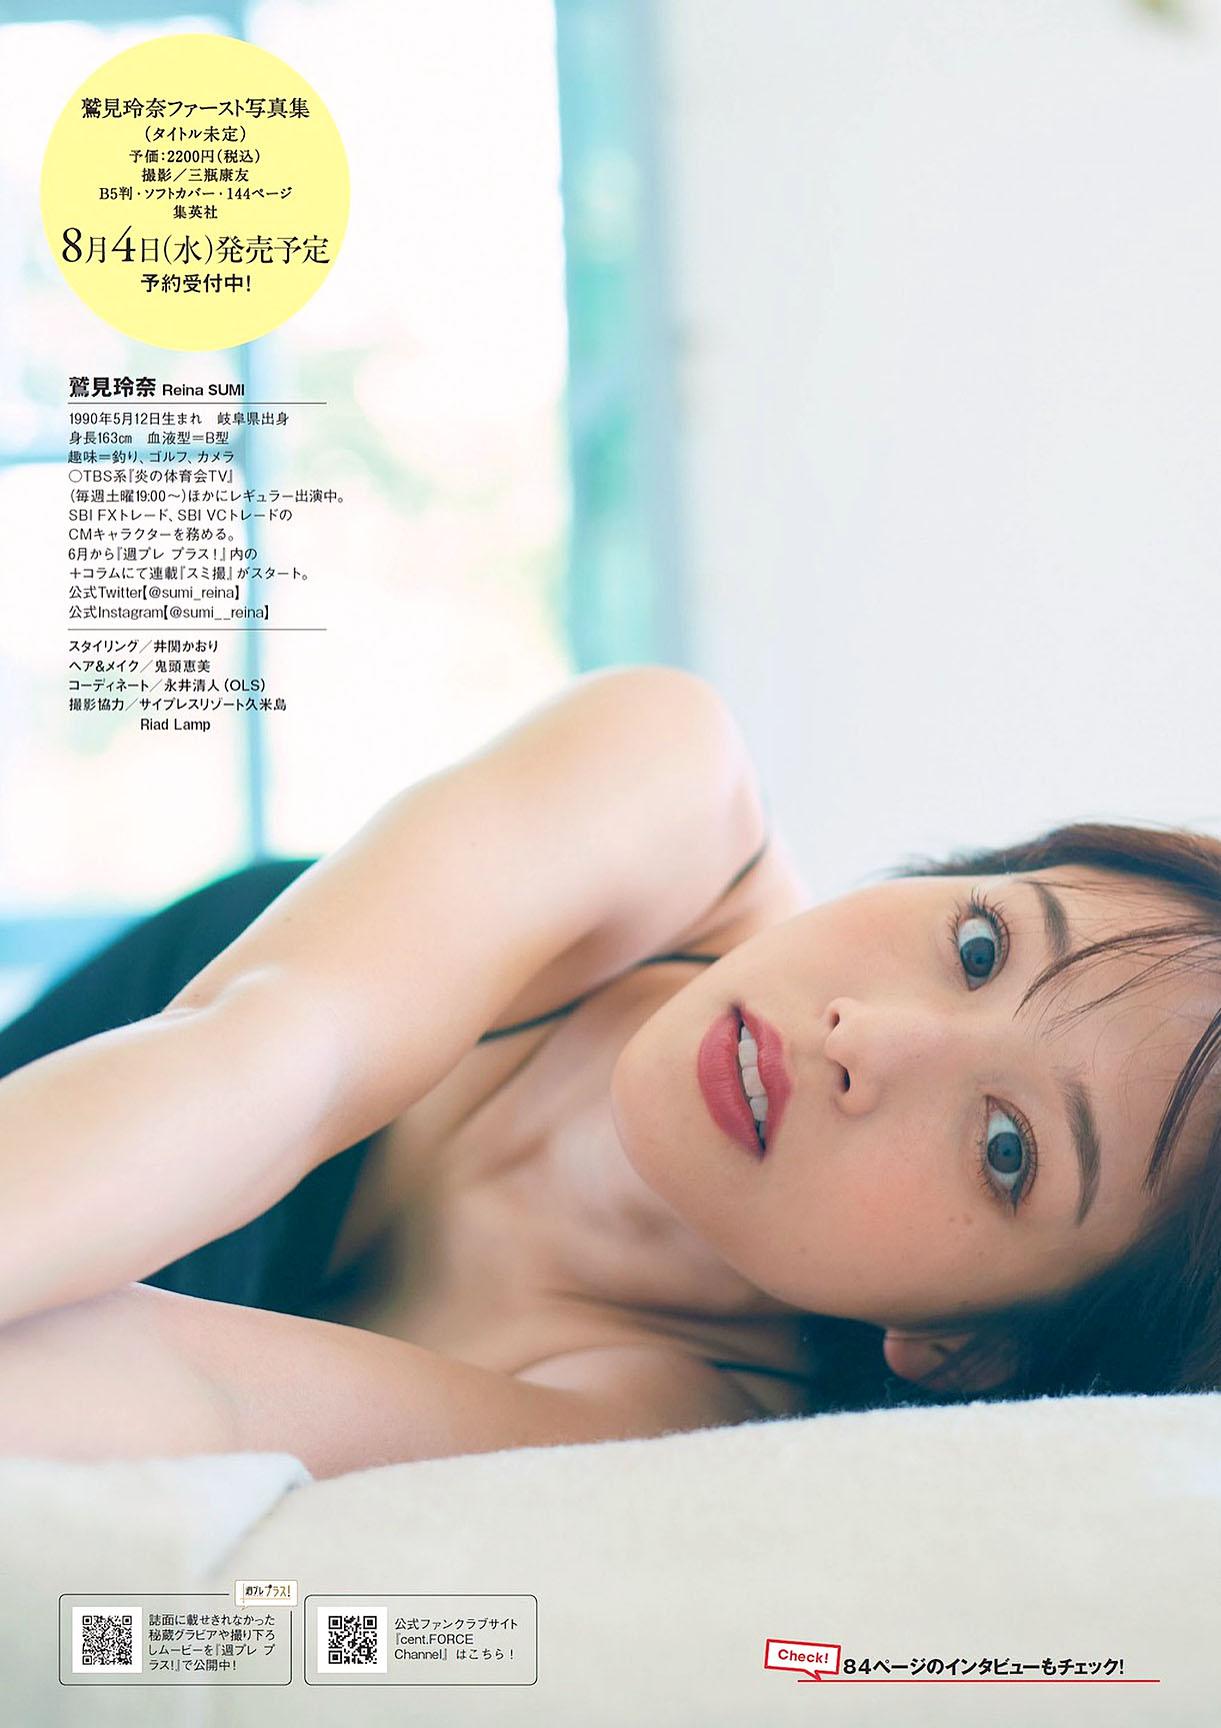 Reina Sumi WPB 210621 08.jpg